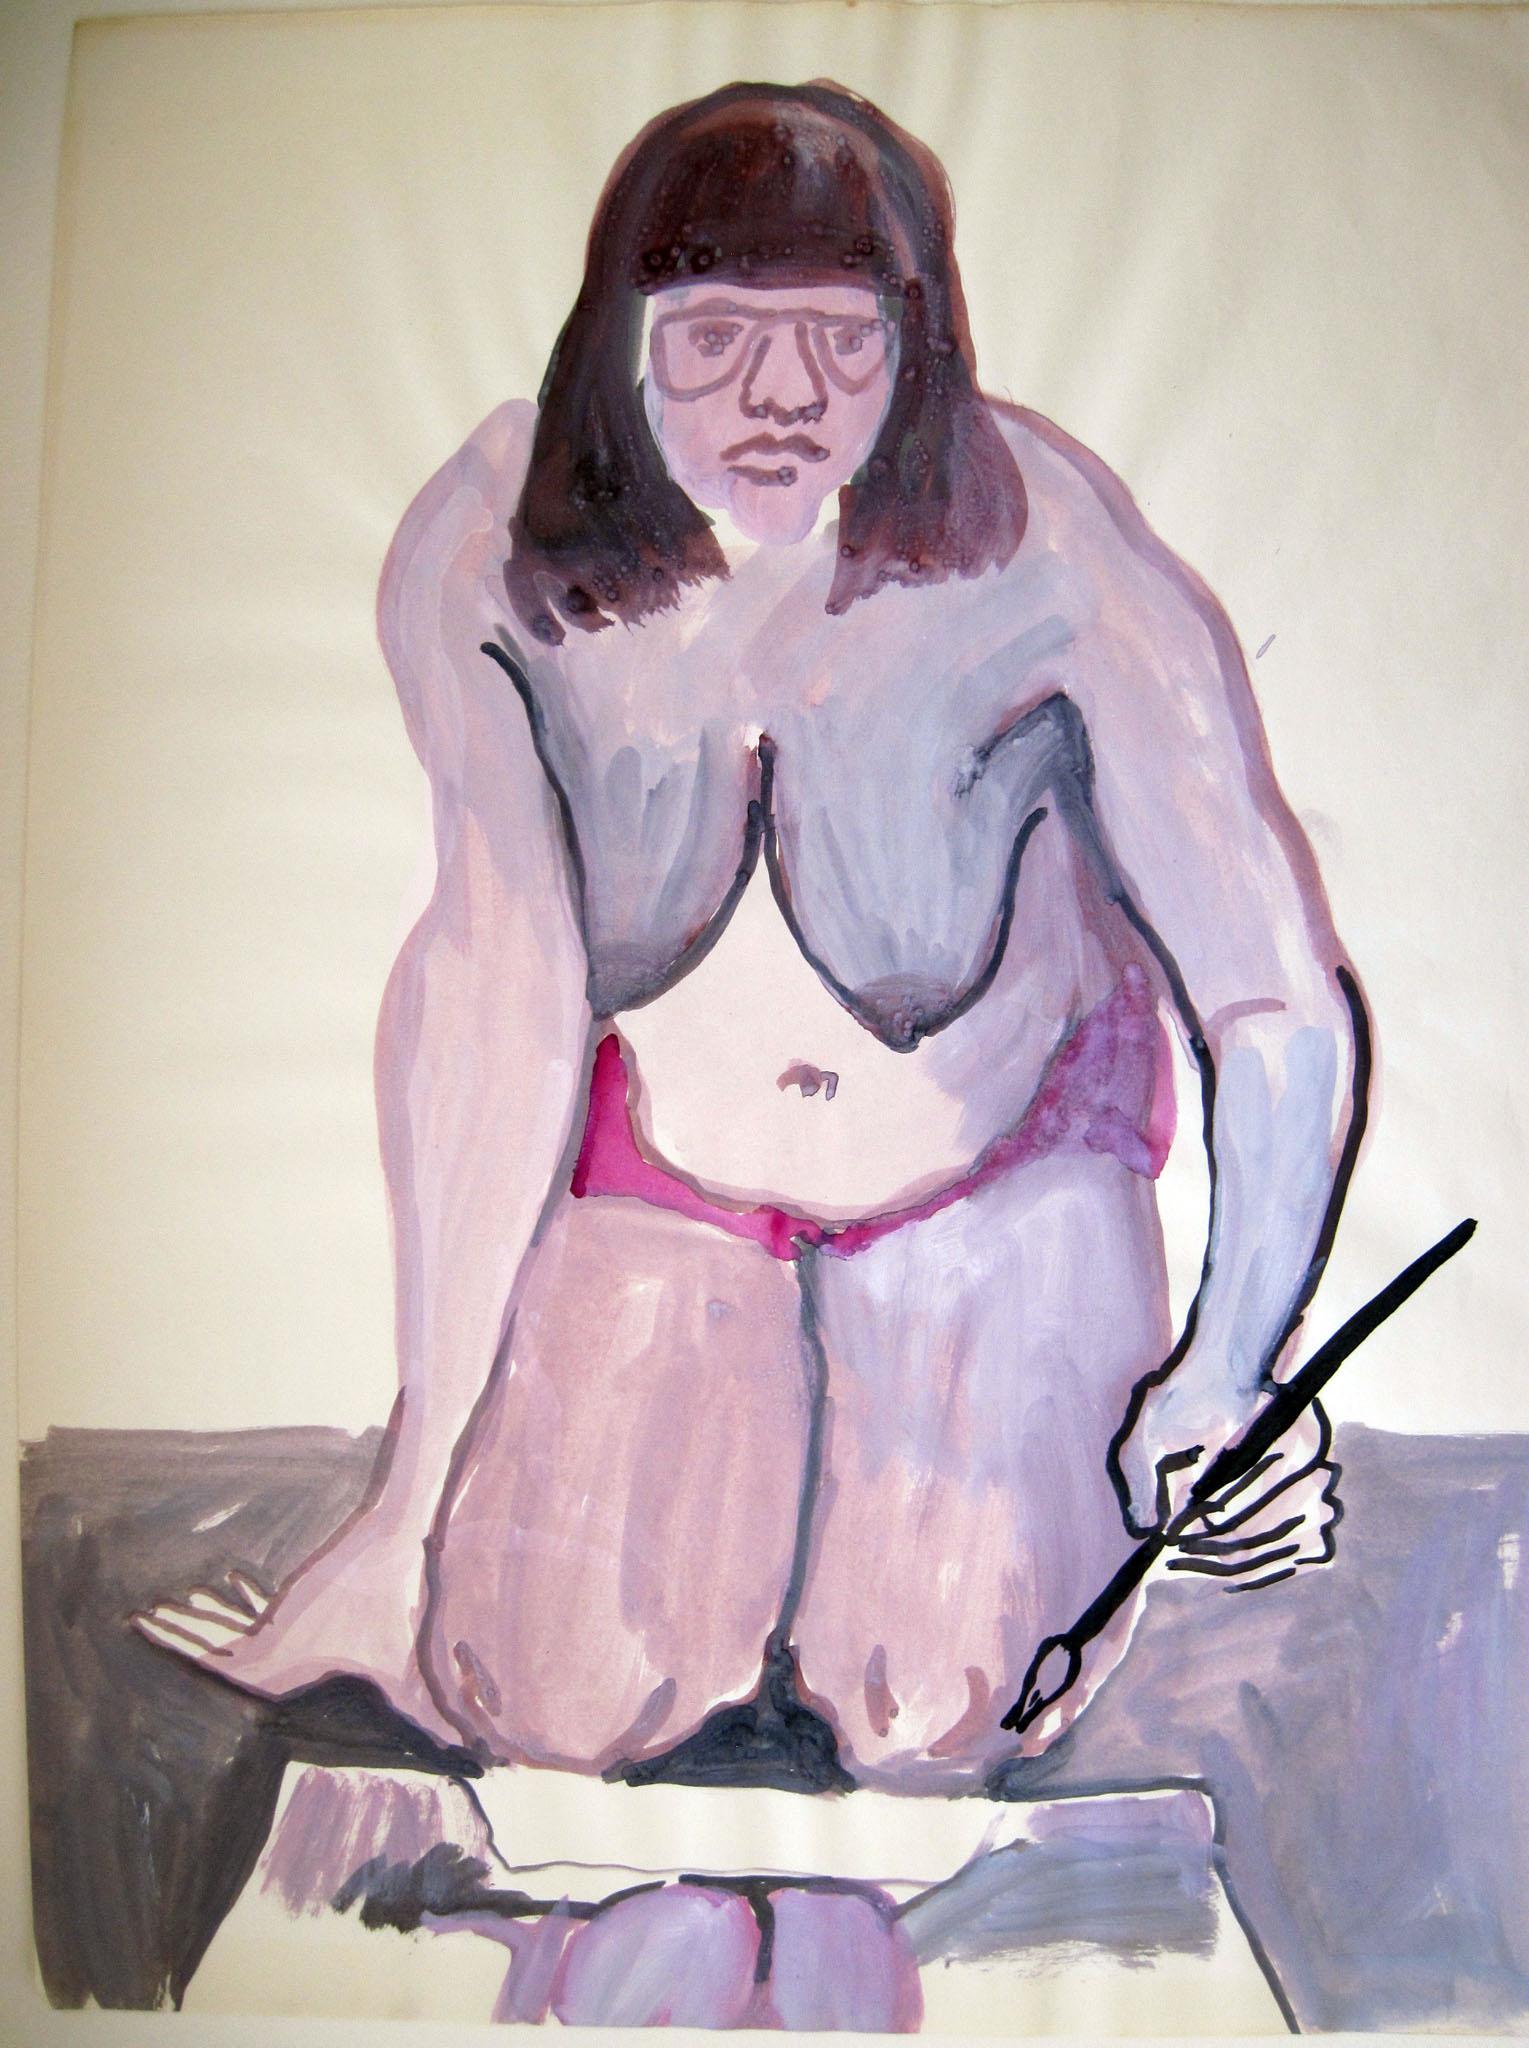 kneeling-self -portrait